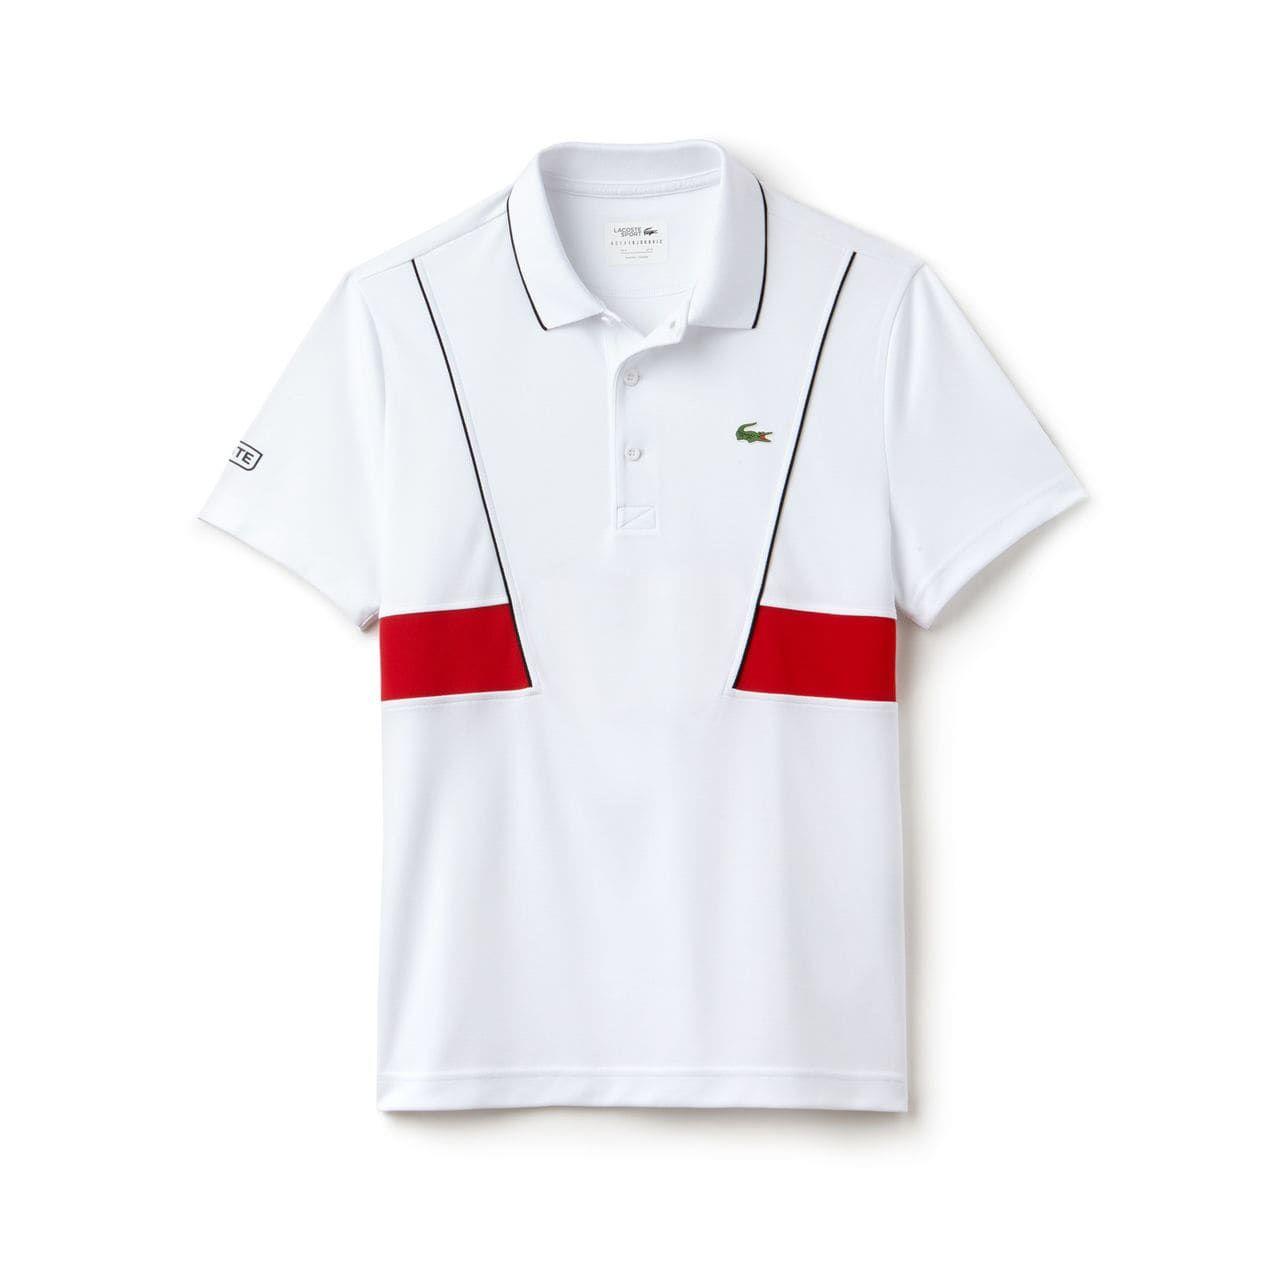 Men S Sport Tech Pique Polo Novak Djokovic Collection Lacoste Novak Djokovic Polo Lacoste Sport